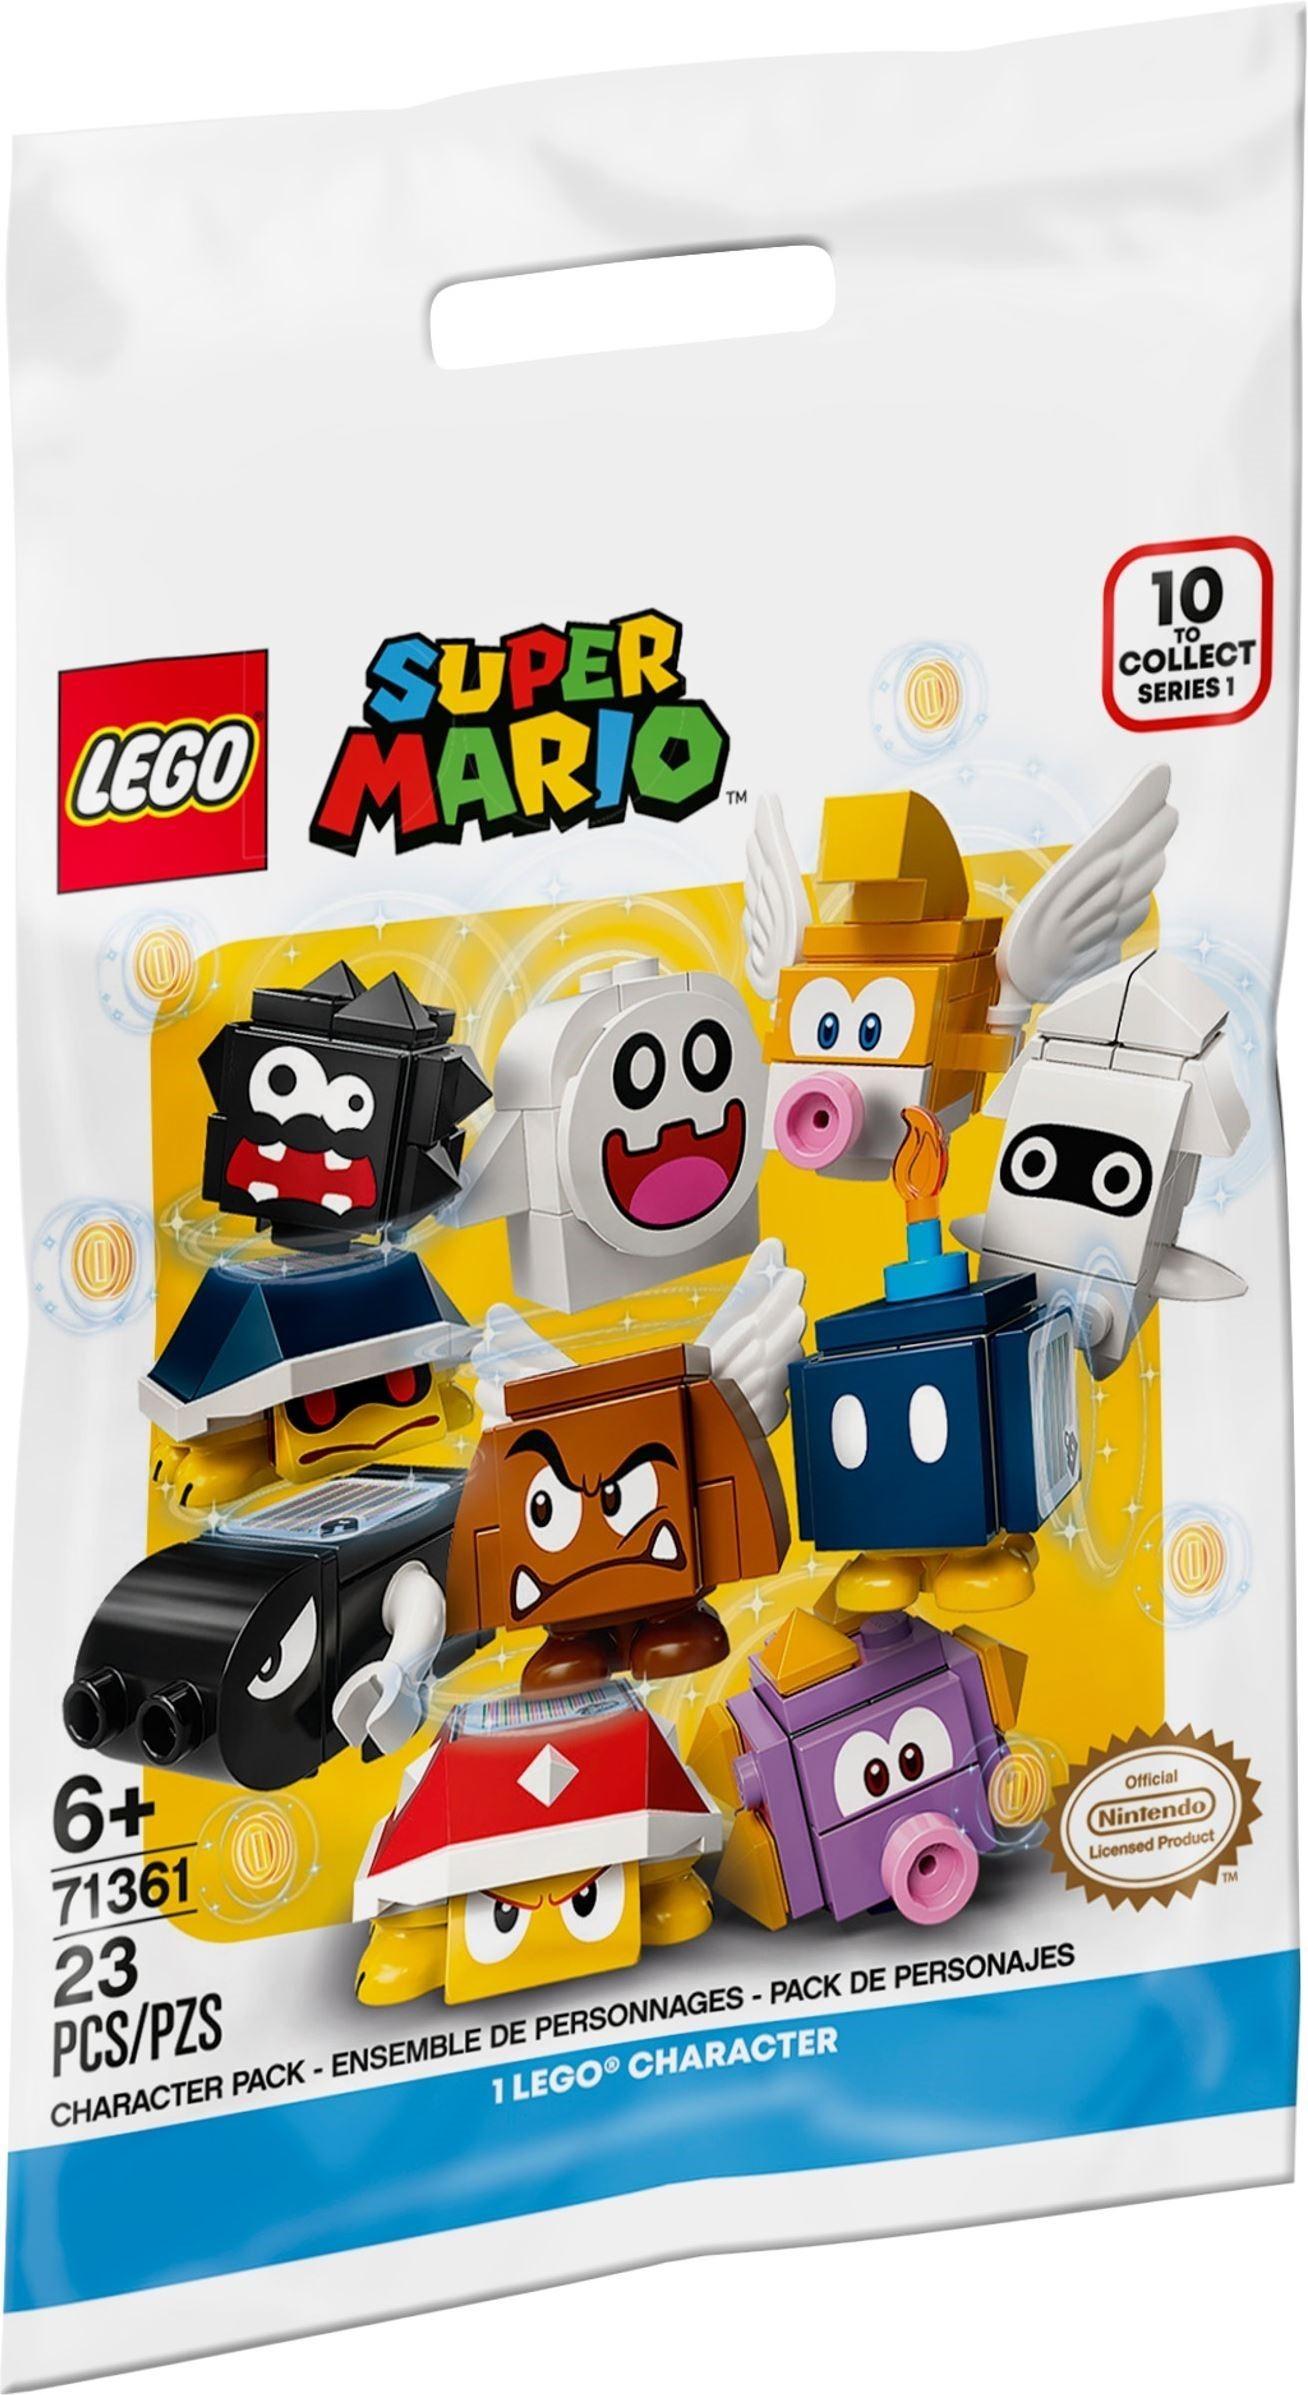 71361 Character Packs